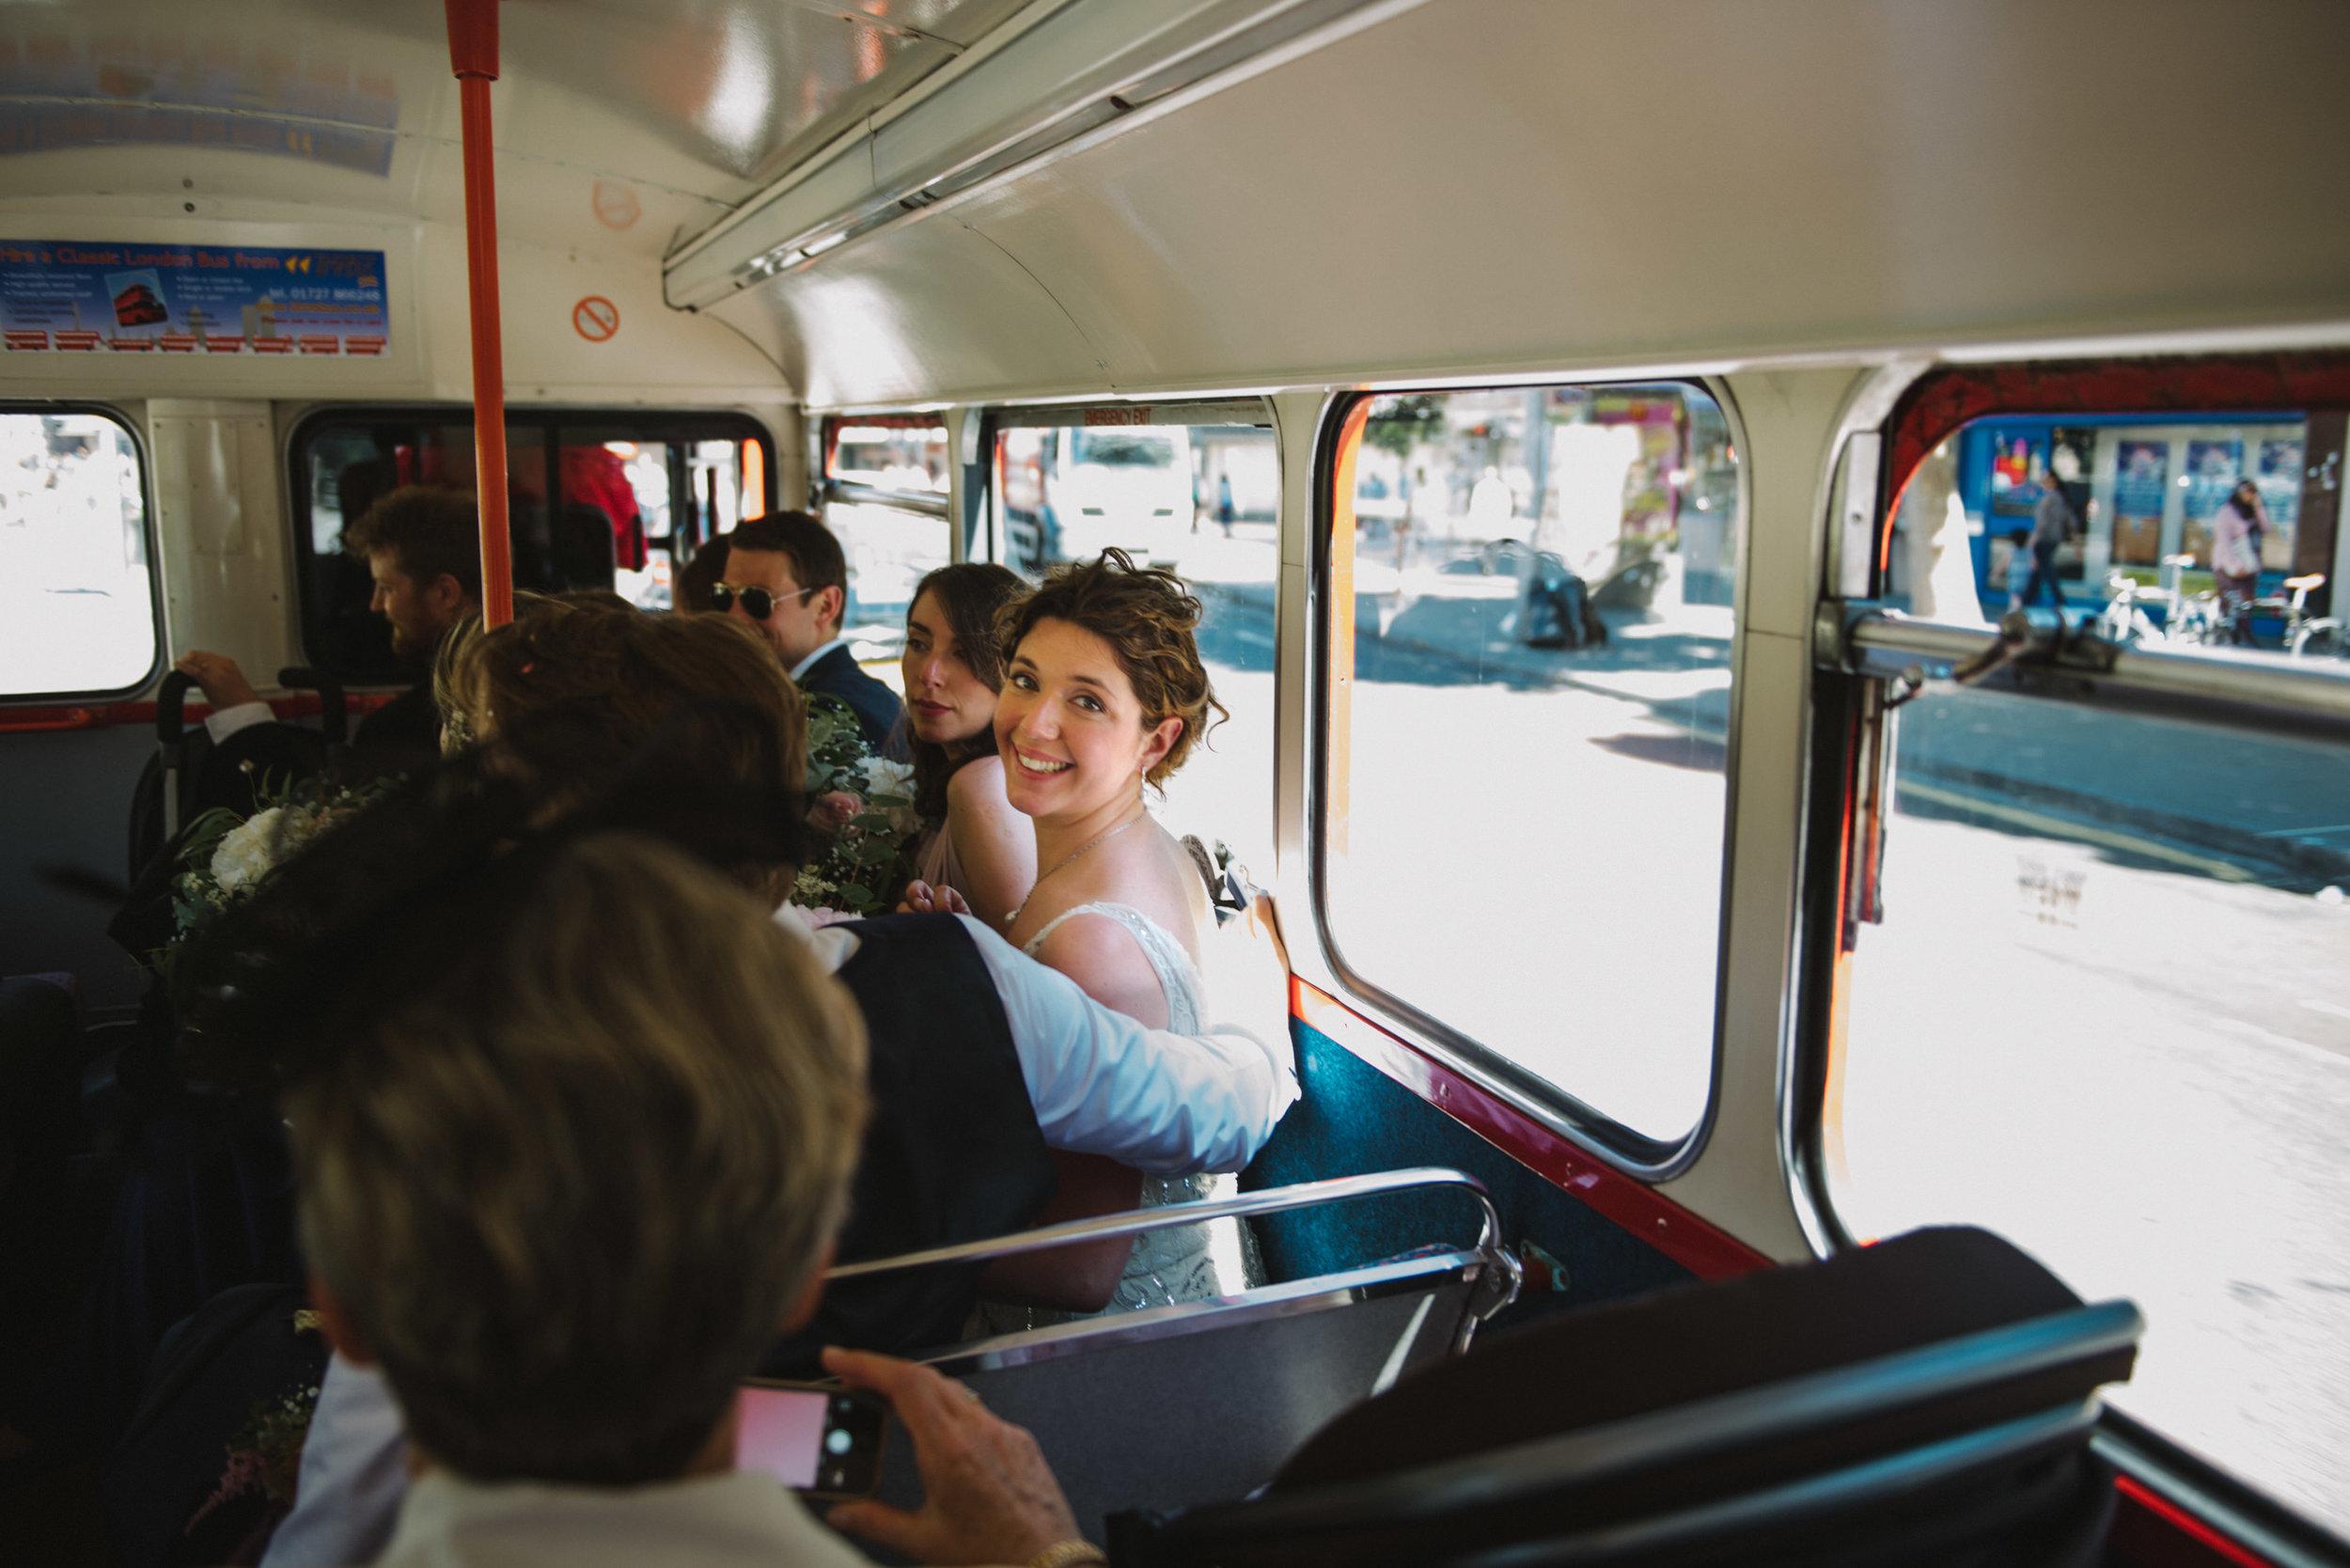 0044-LISA-DEVINE-PHOTOGRAPHY-ALTERNATIVE-WEDDING-PHOTOGRAPHY-SCOTLAND-DESTINATION-WEDDINGS-GLASGOW-WEDDINGS-COOL-WEDDINGS-STYLISH-WEDDINGS.JPG